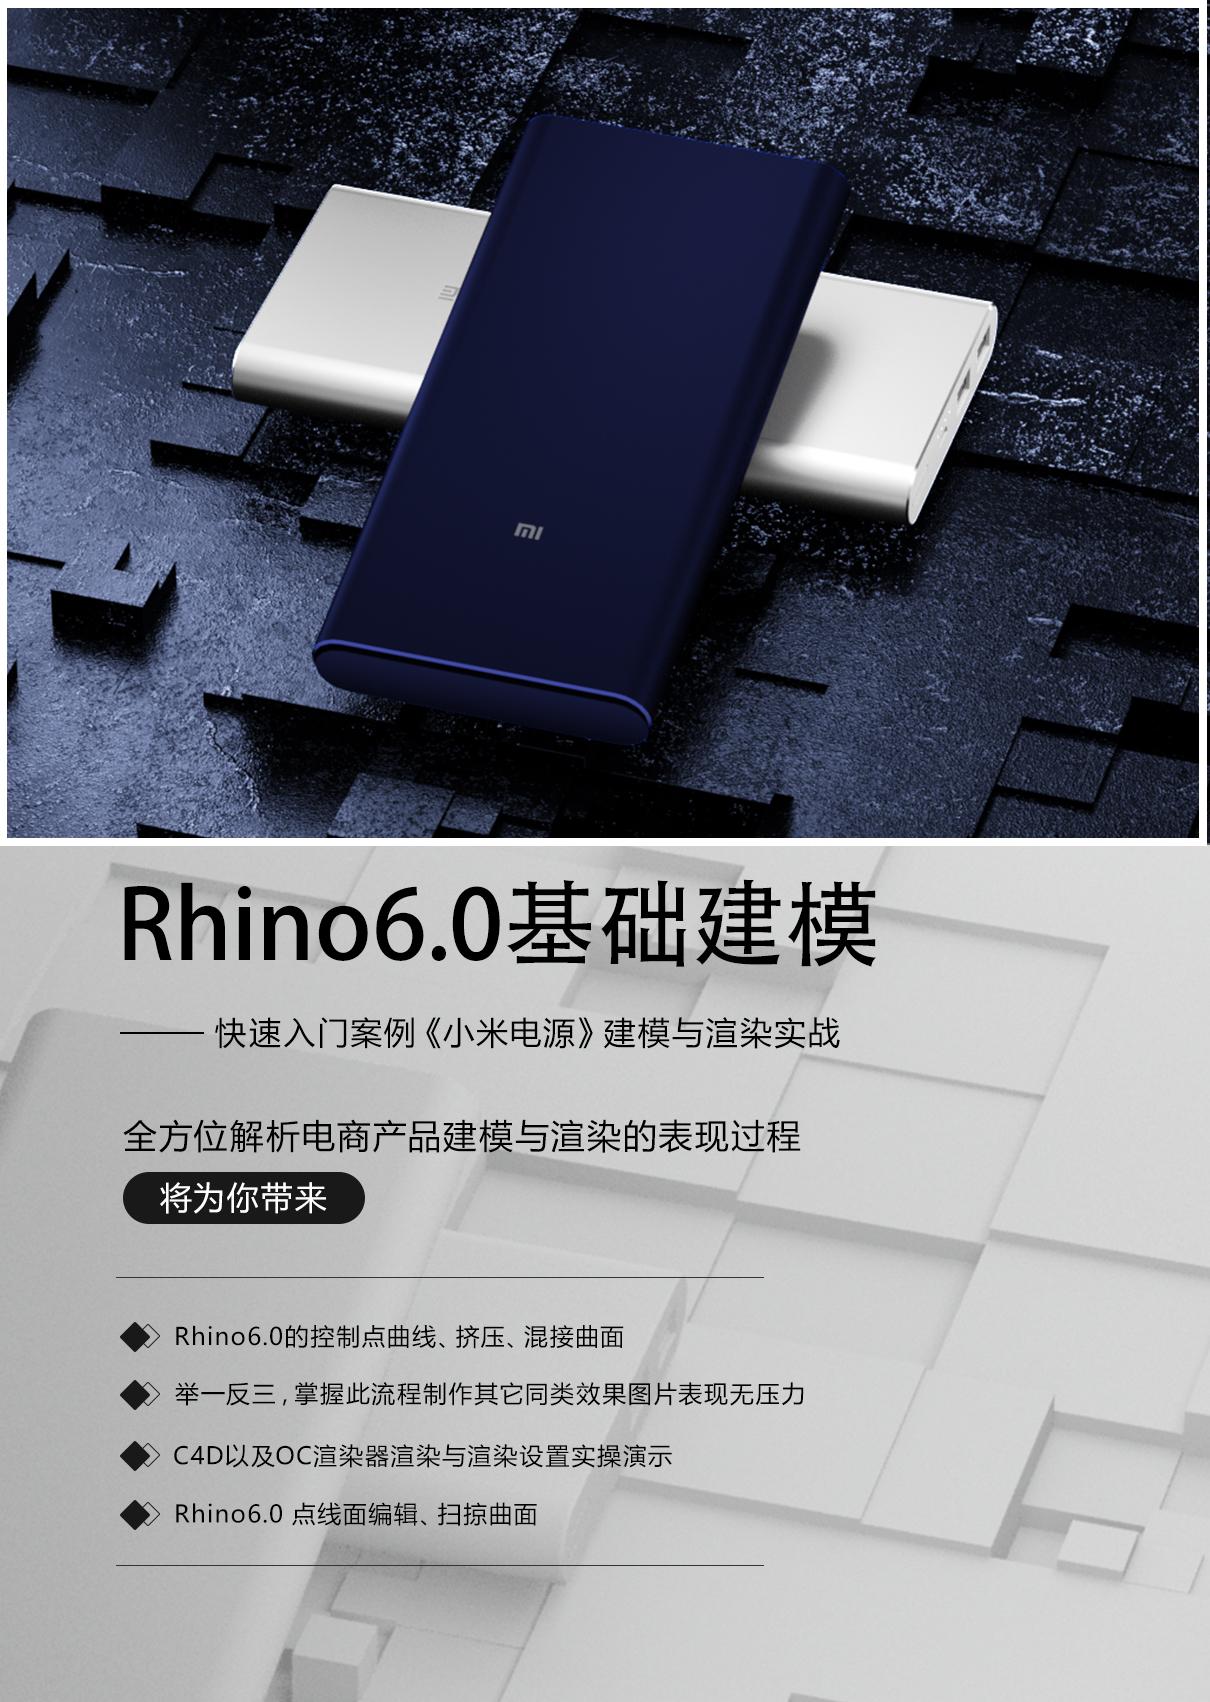 Rhino小米电源建模